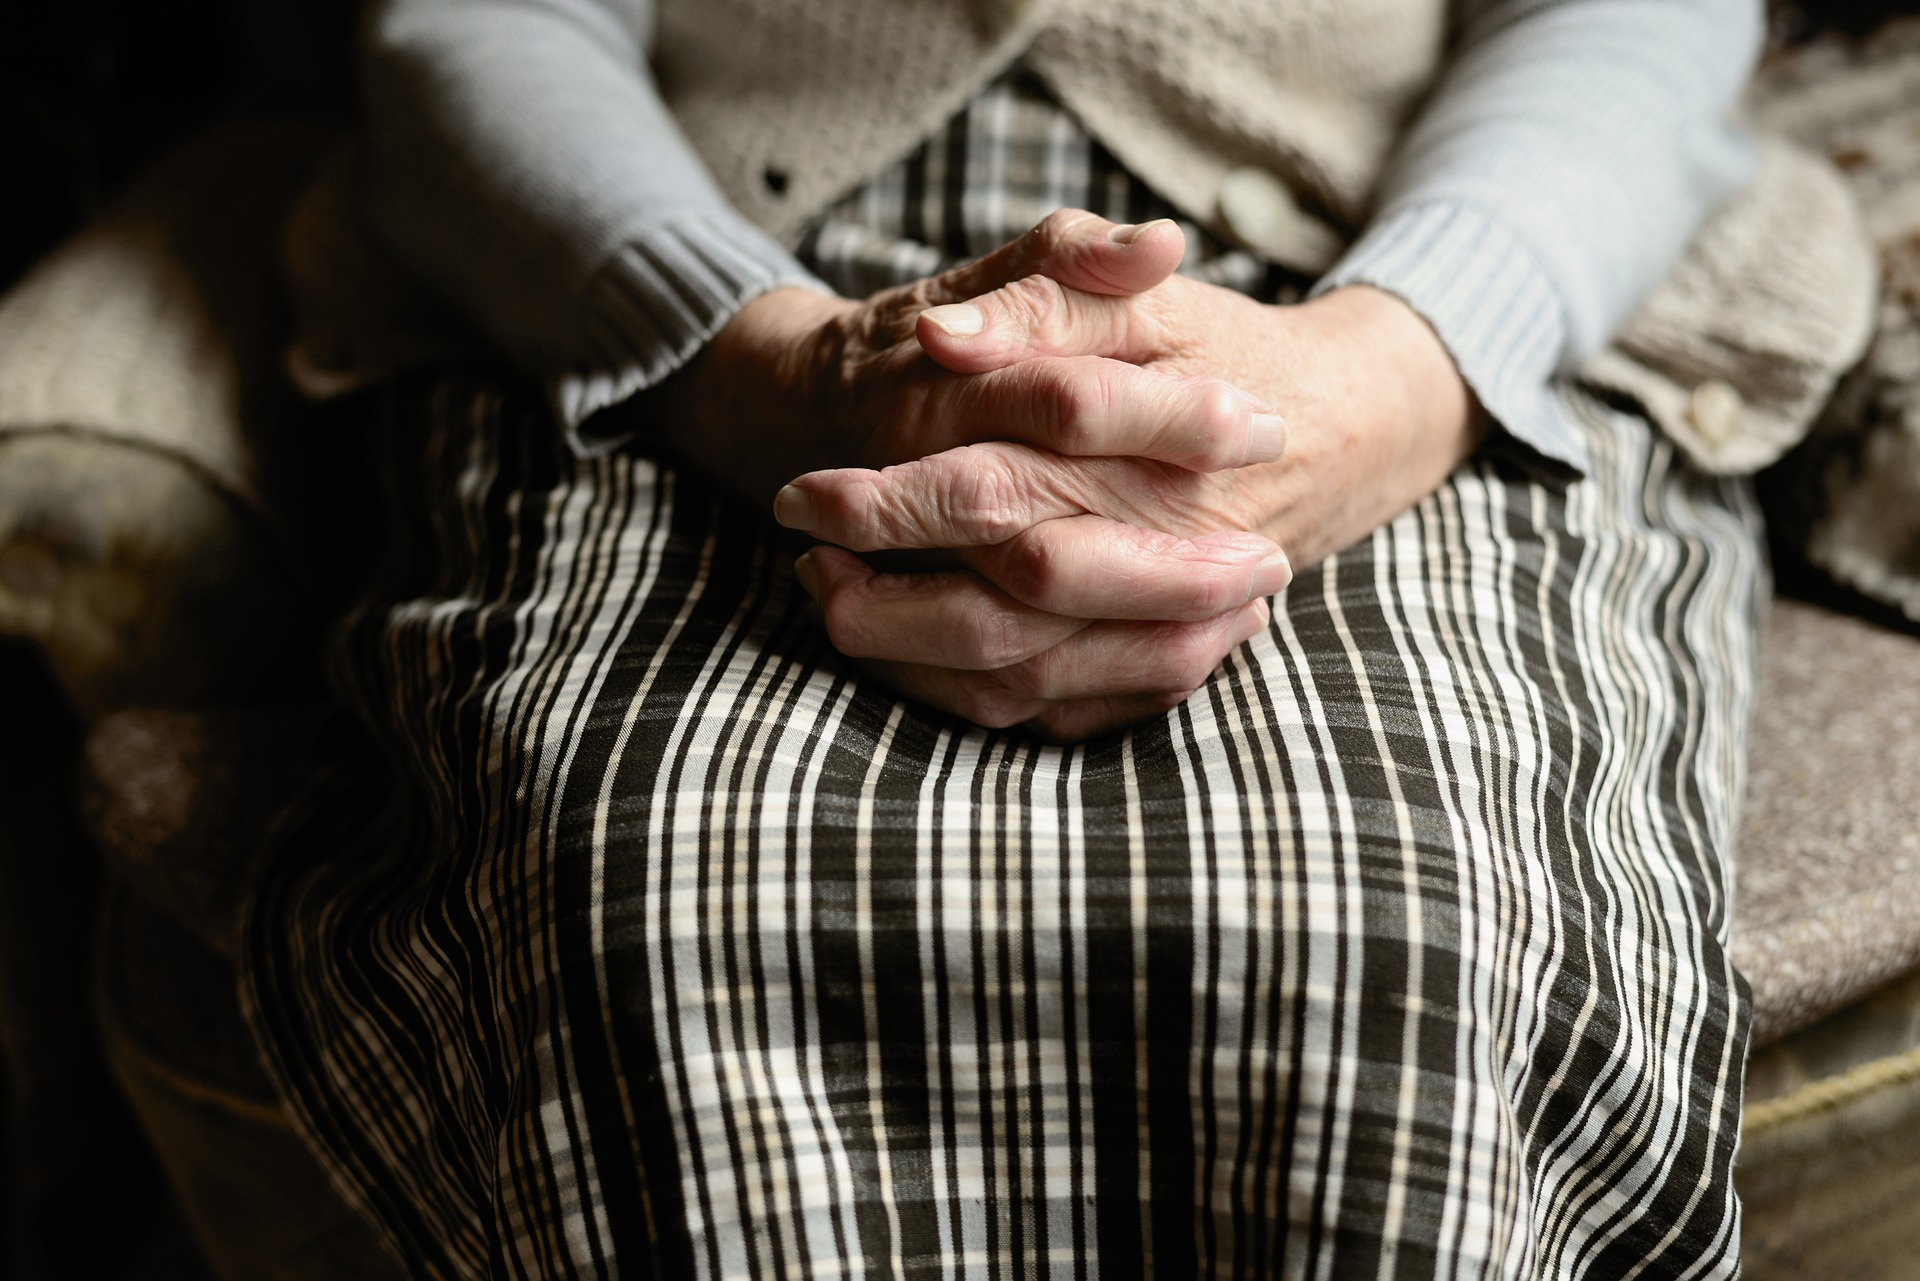 Coronavirus: a Sassari servizi per gli anziani